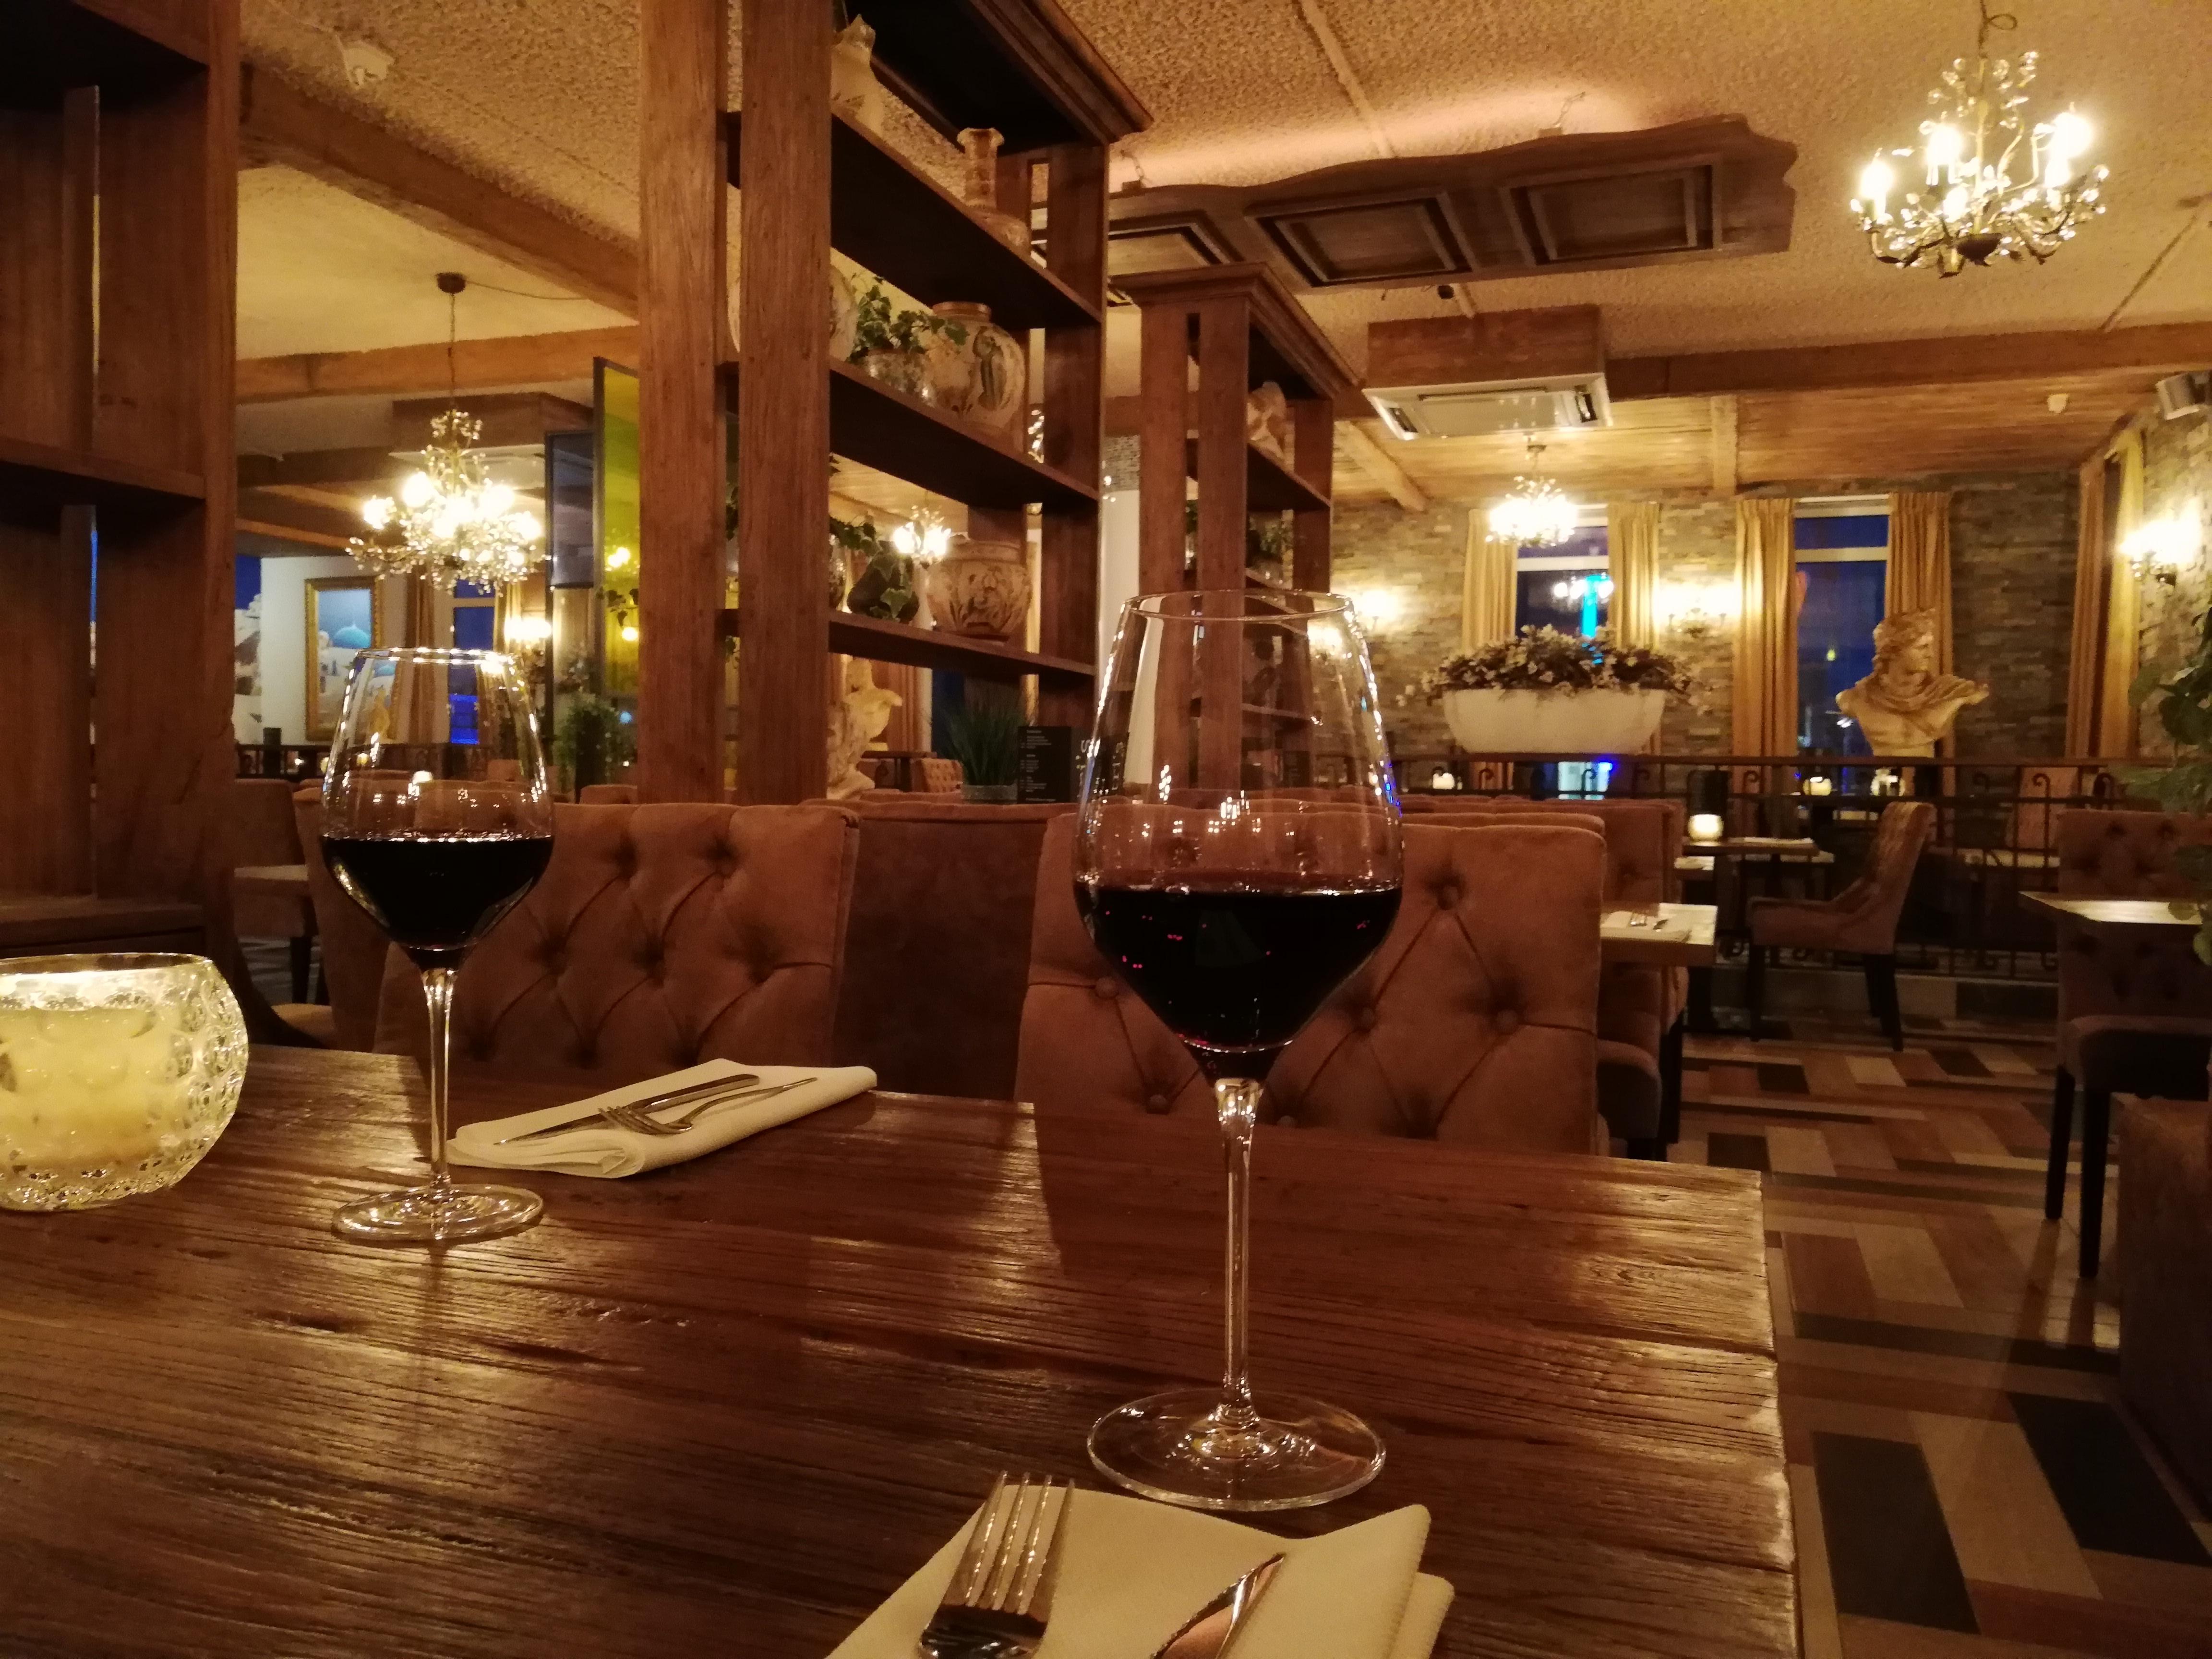 Dimitri's in Heumen - Eet nu